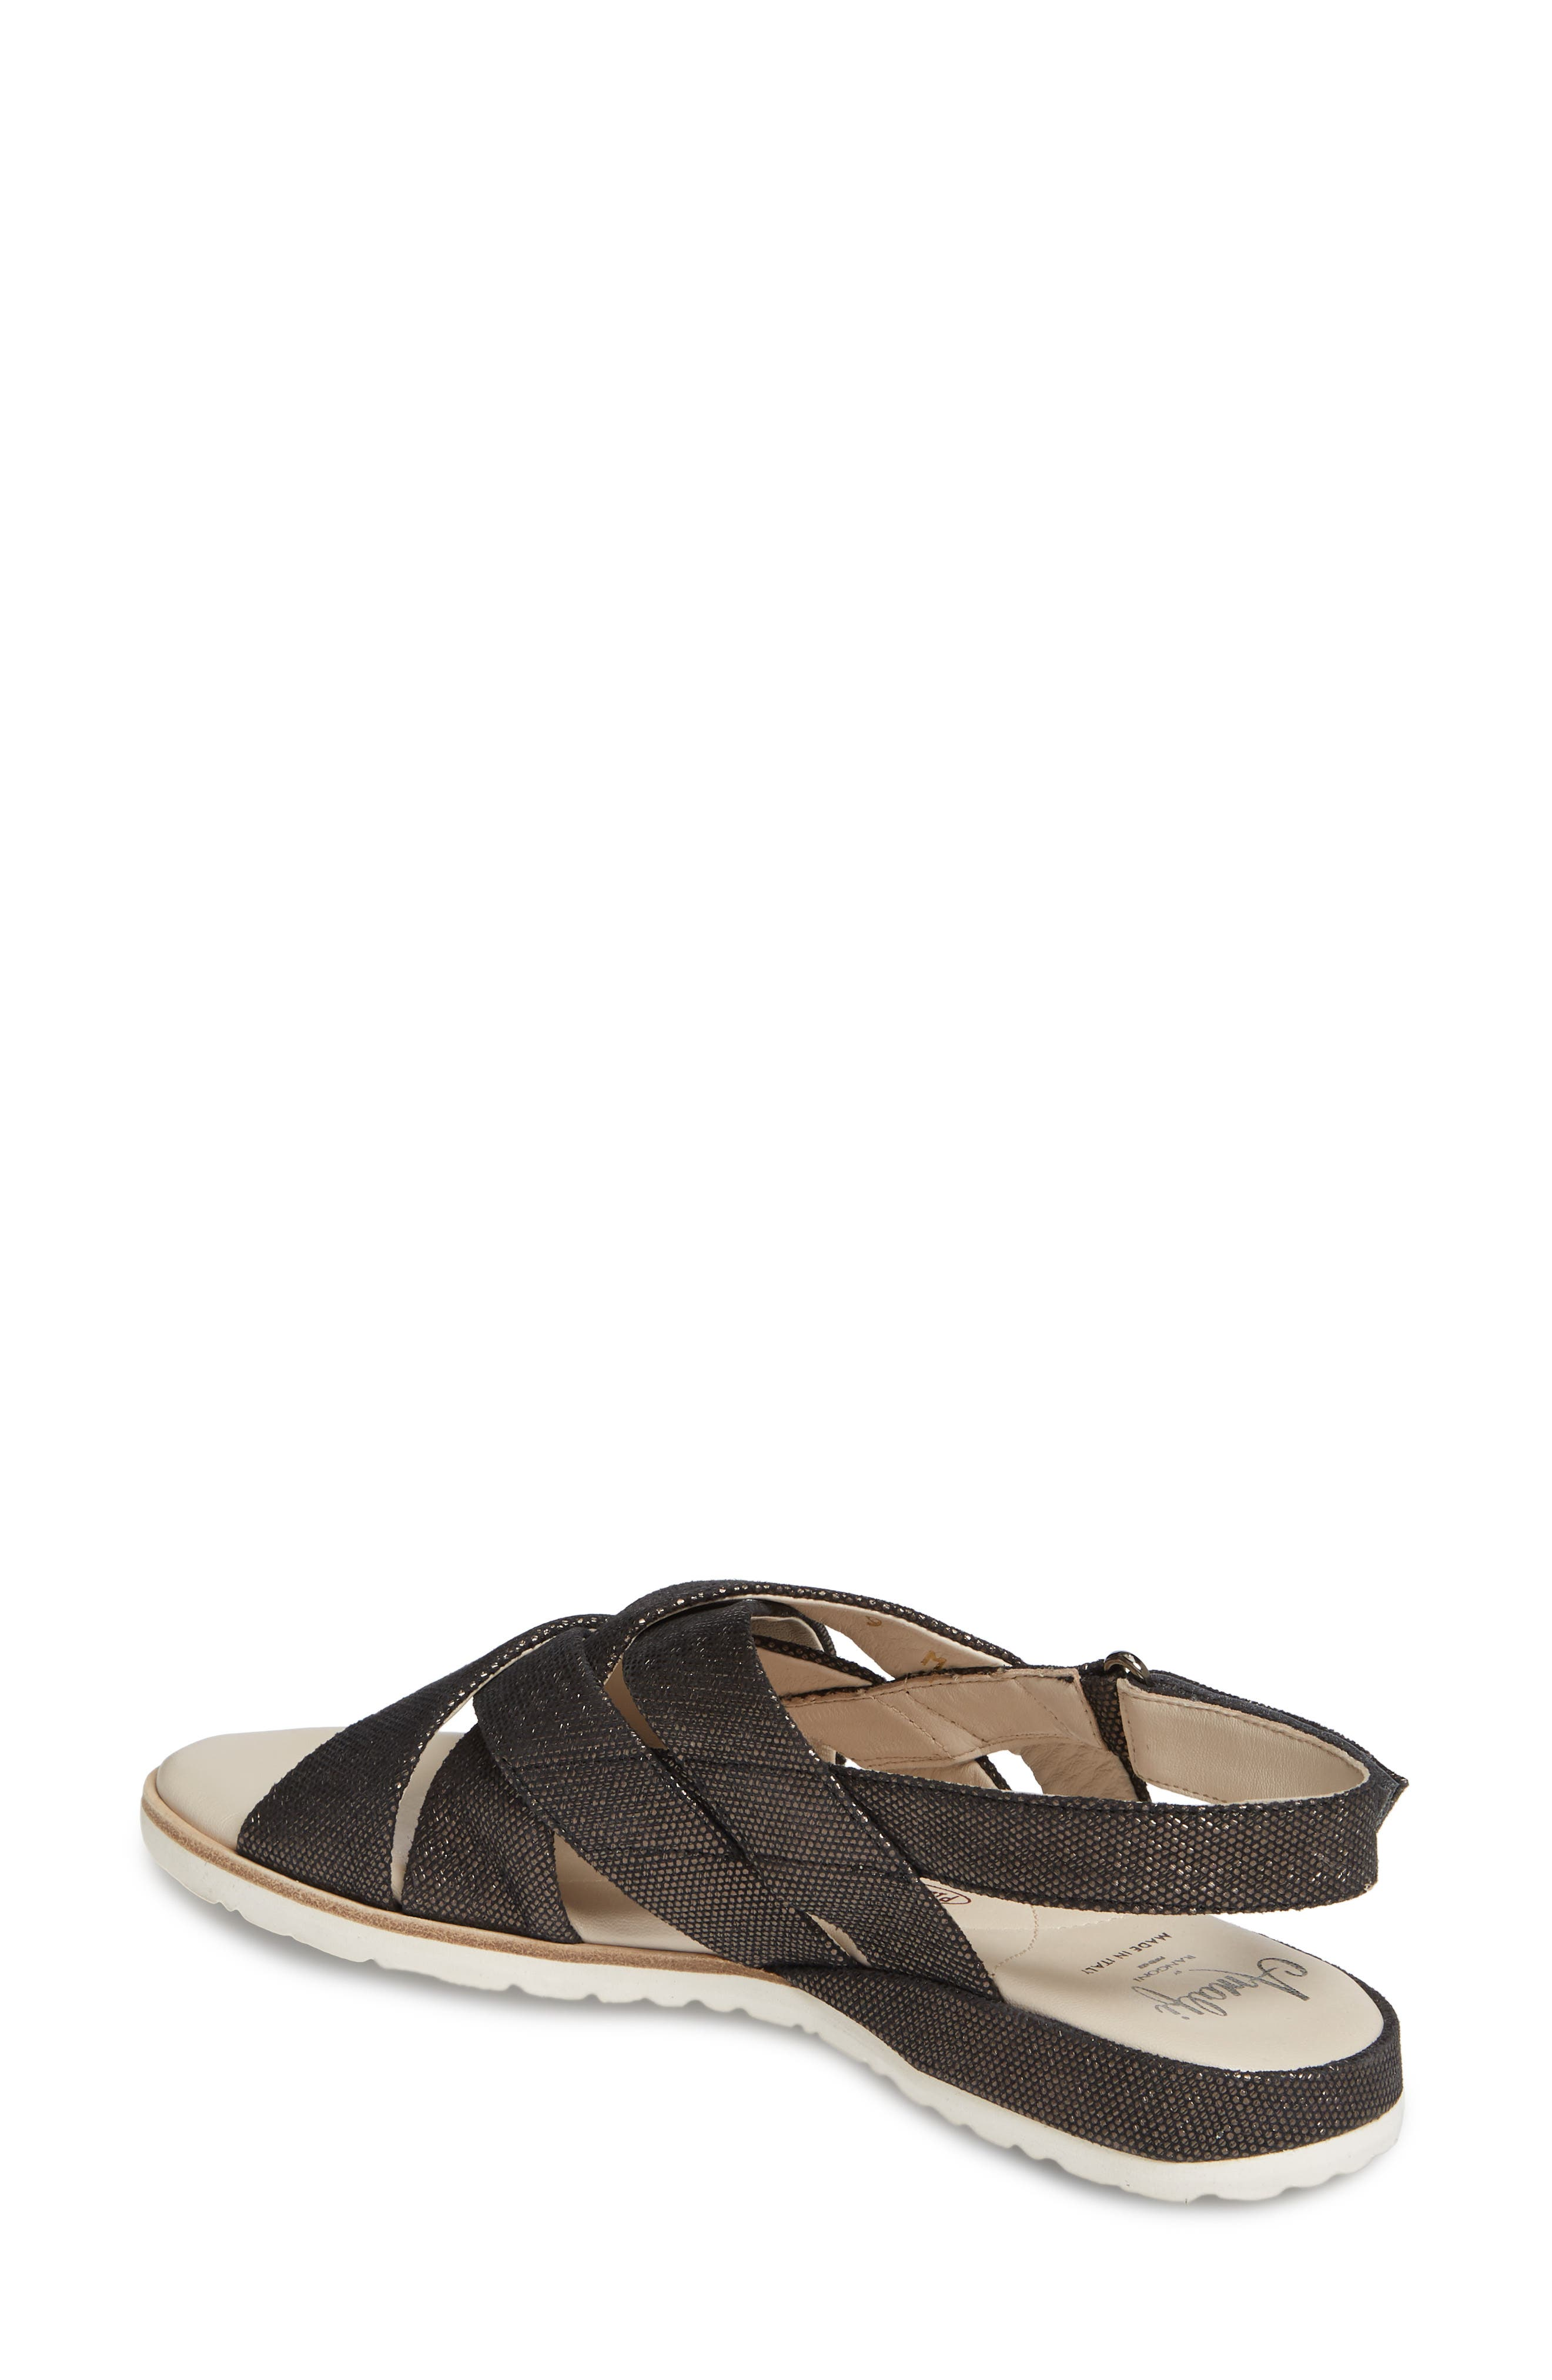 ,                             Biondina Textured Sandal,                             Alternate thumbnail 2, color,                             GRAPHITE LEATHER